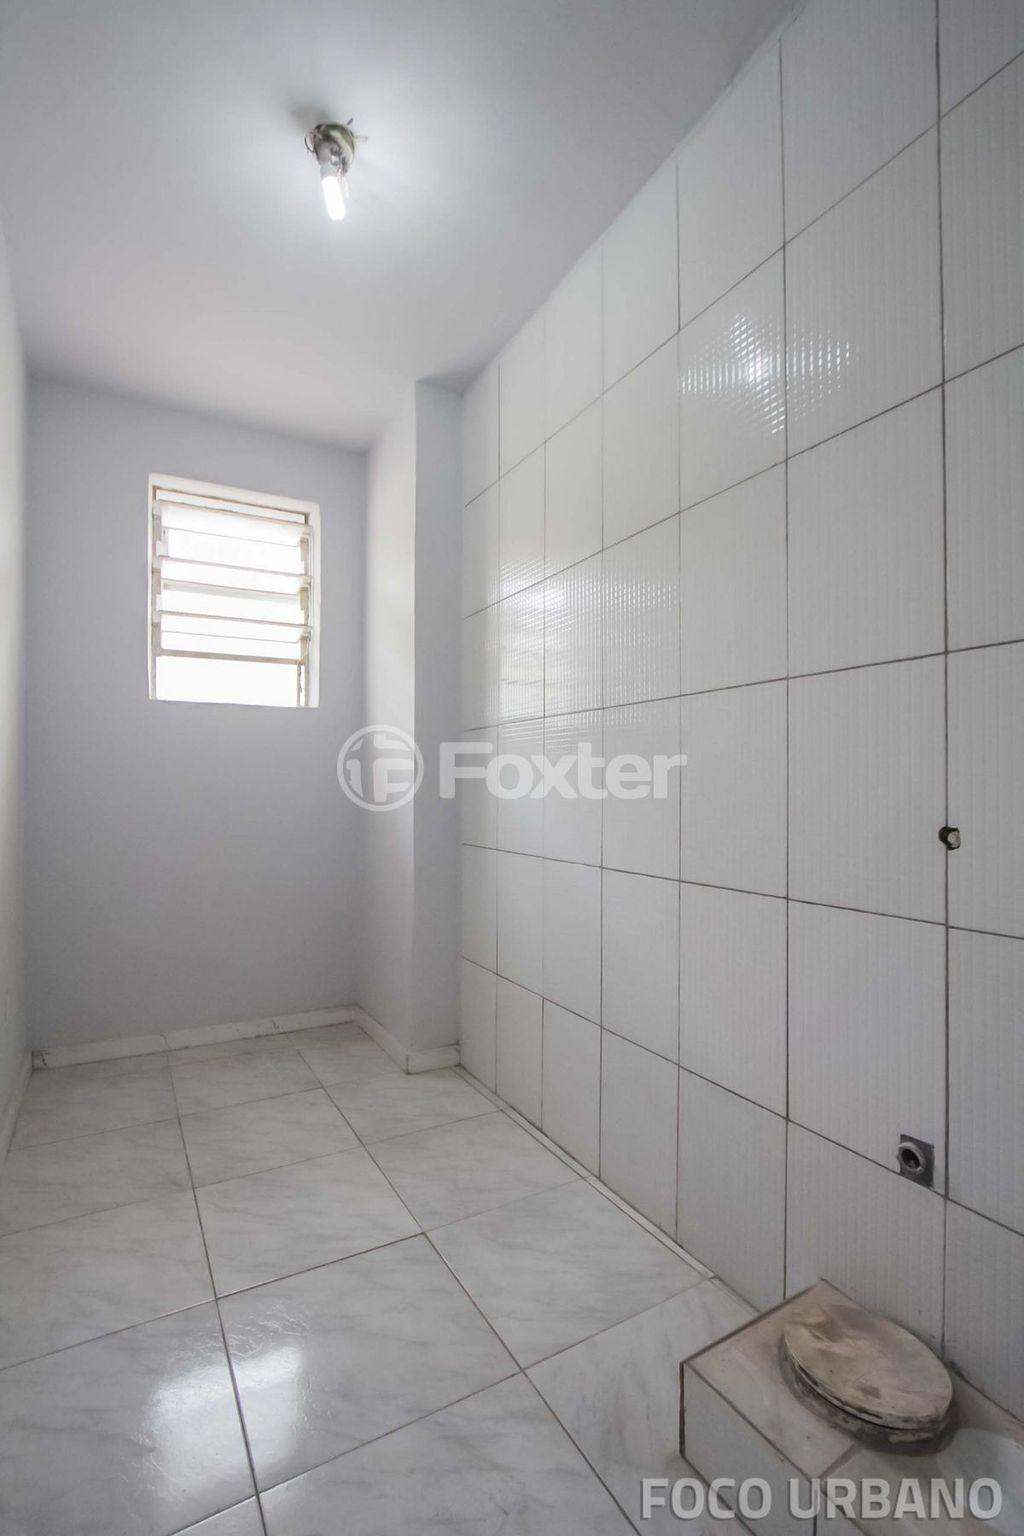 Apto 2 Dorm, Floresta, Porto Alegre (141838) - Foto 7